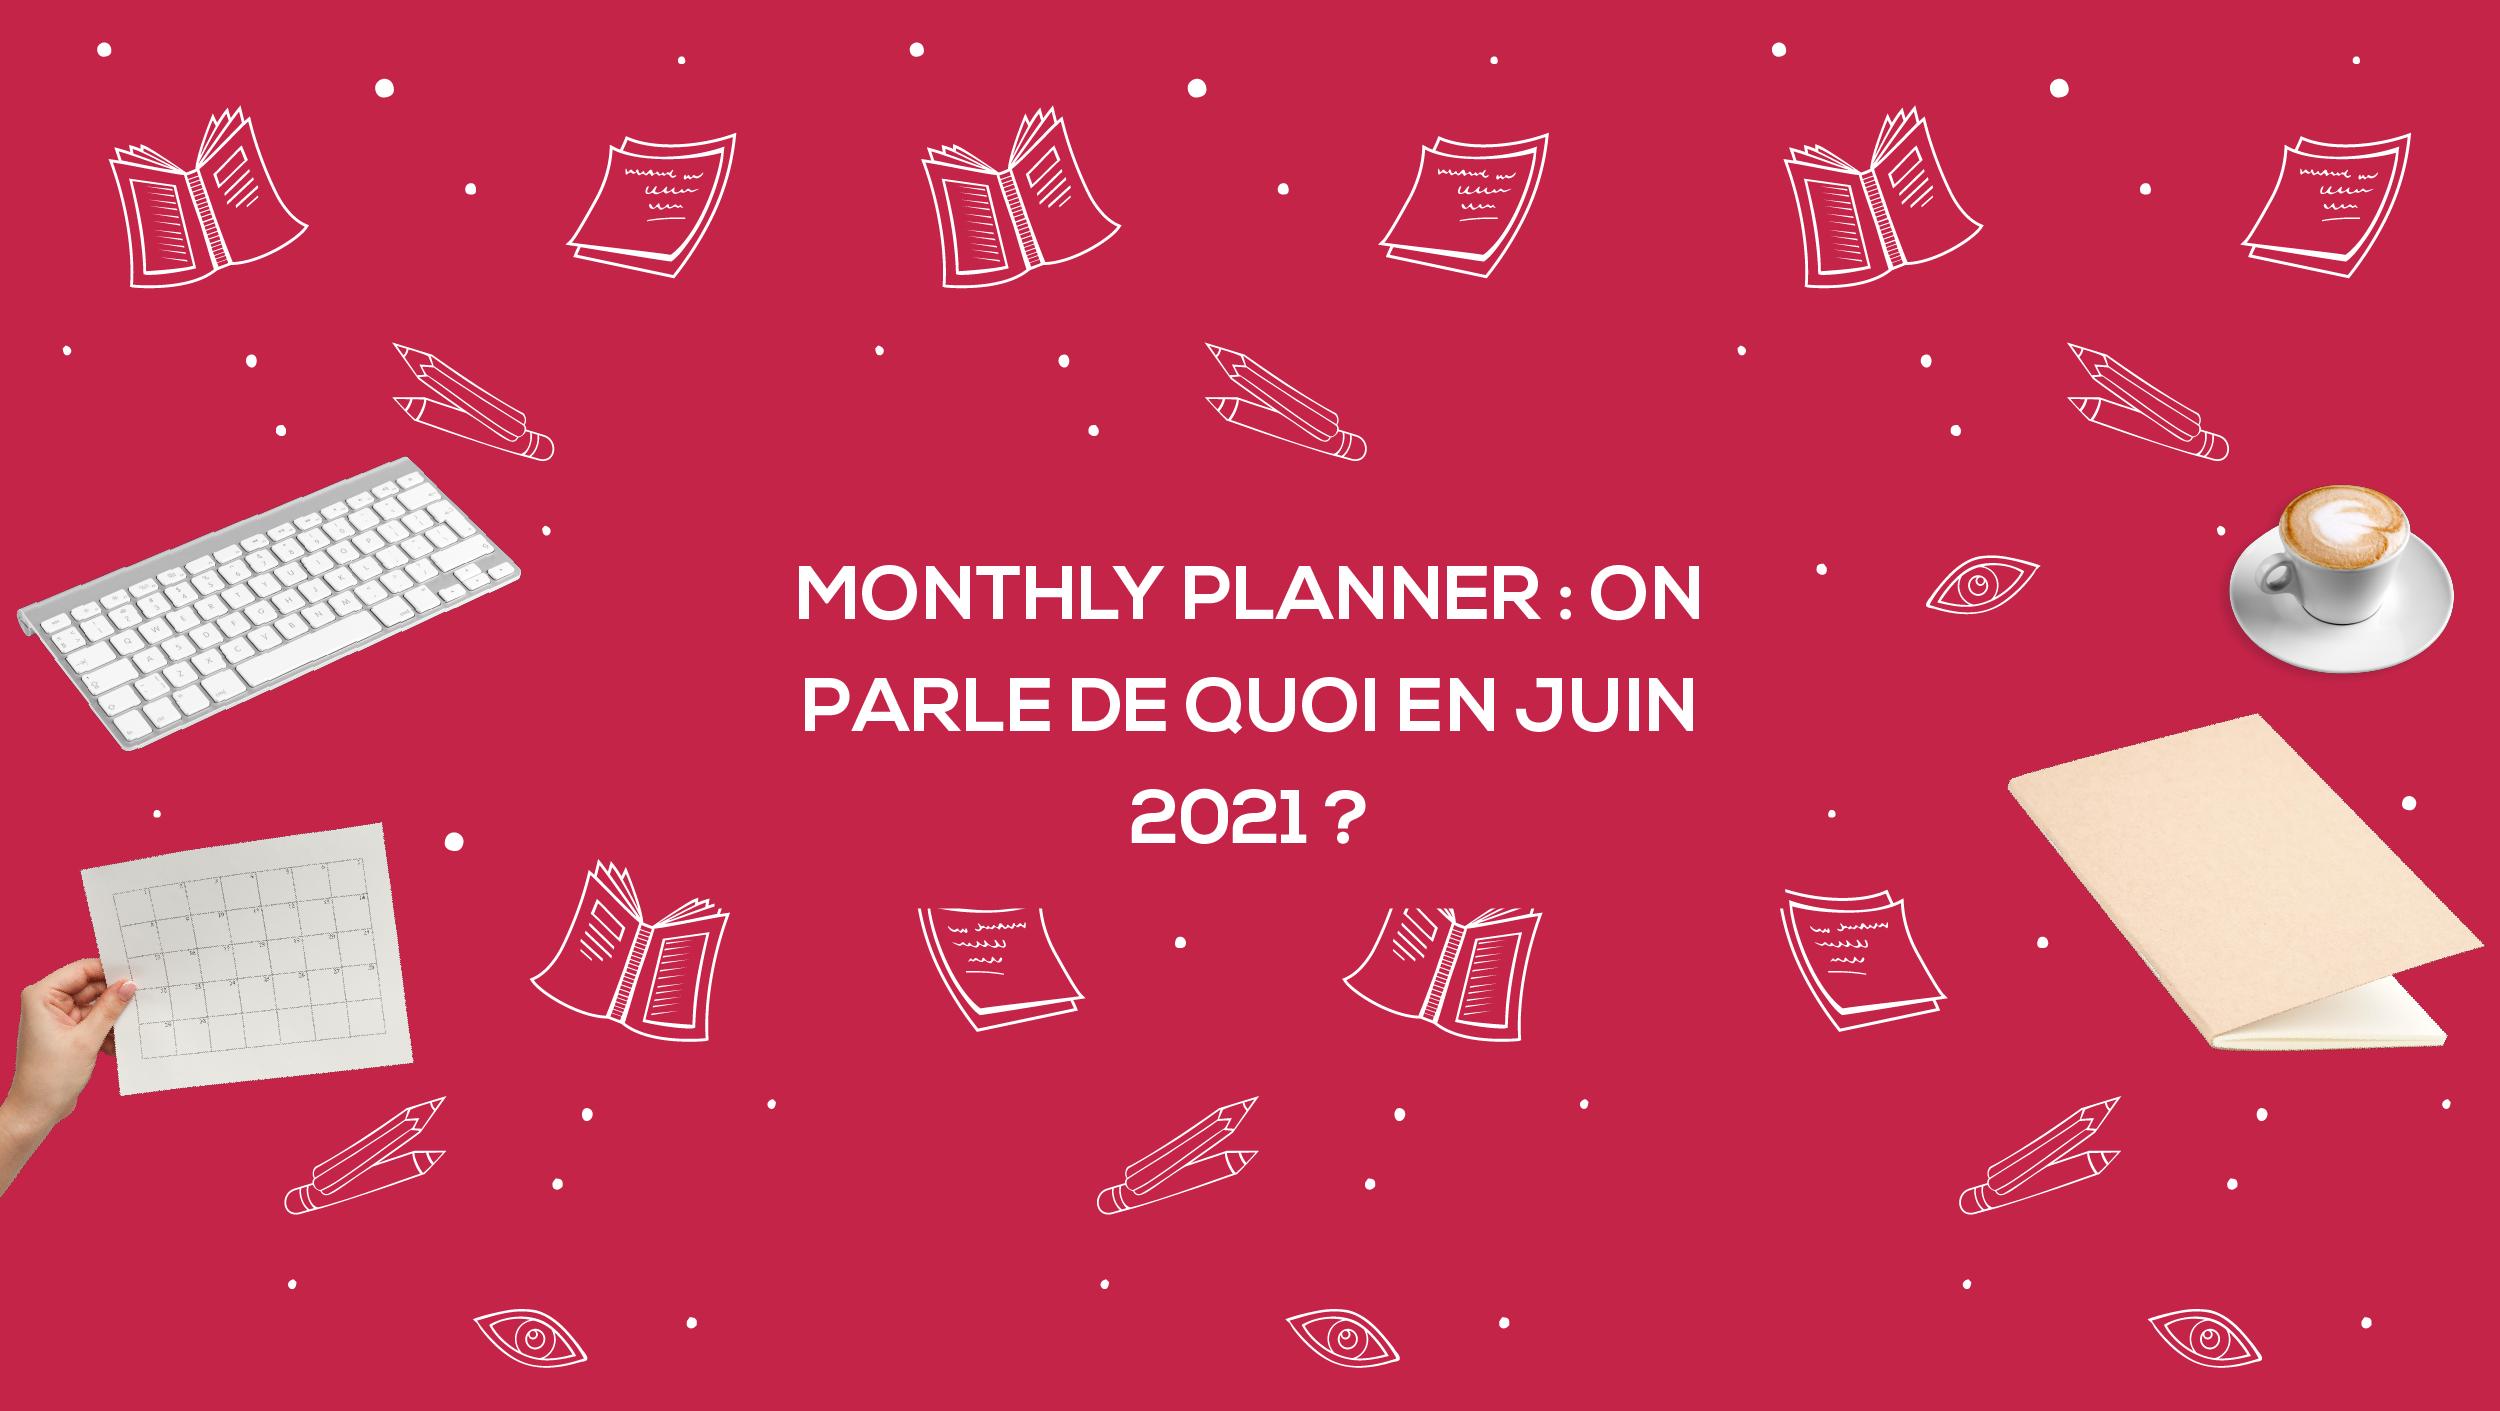 Monthly Planner : on parle de quoi en juin 2021 ?